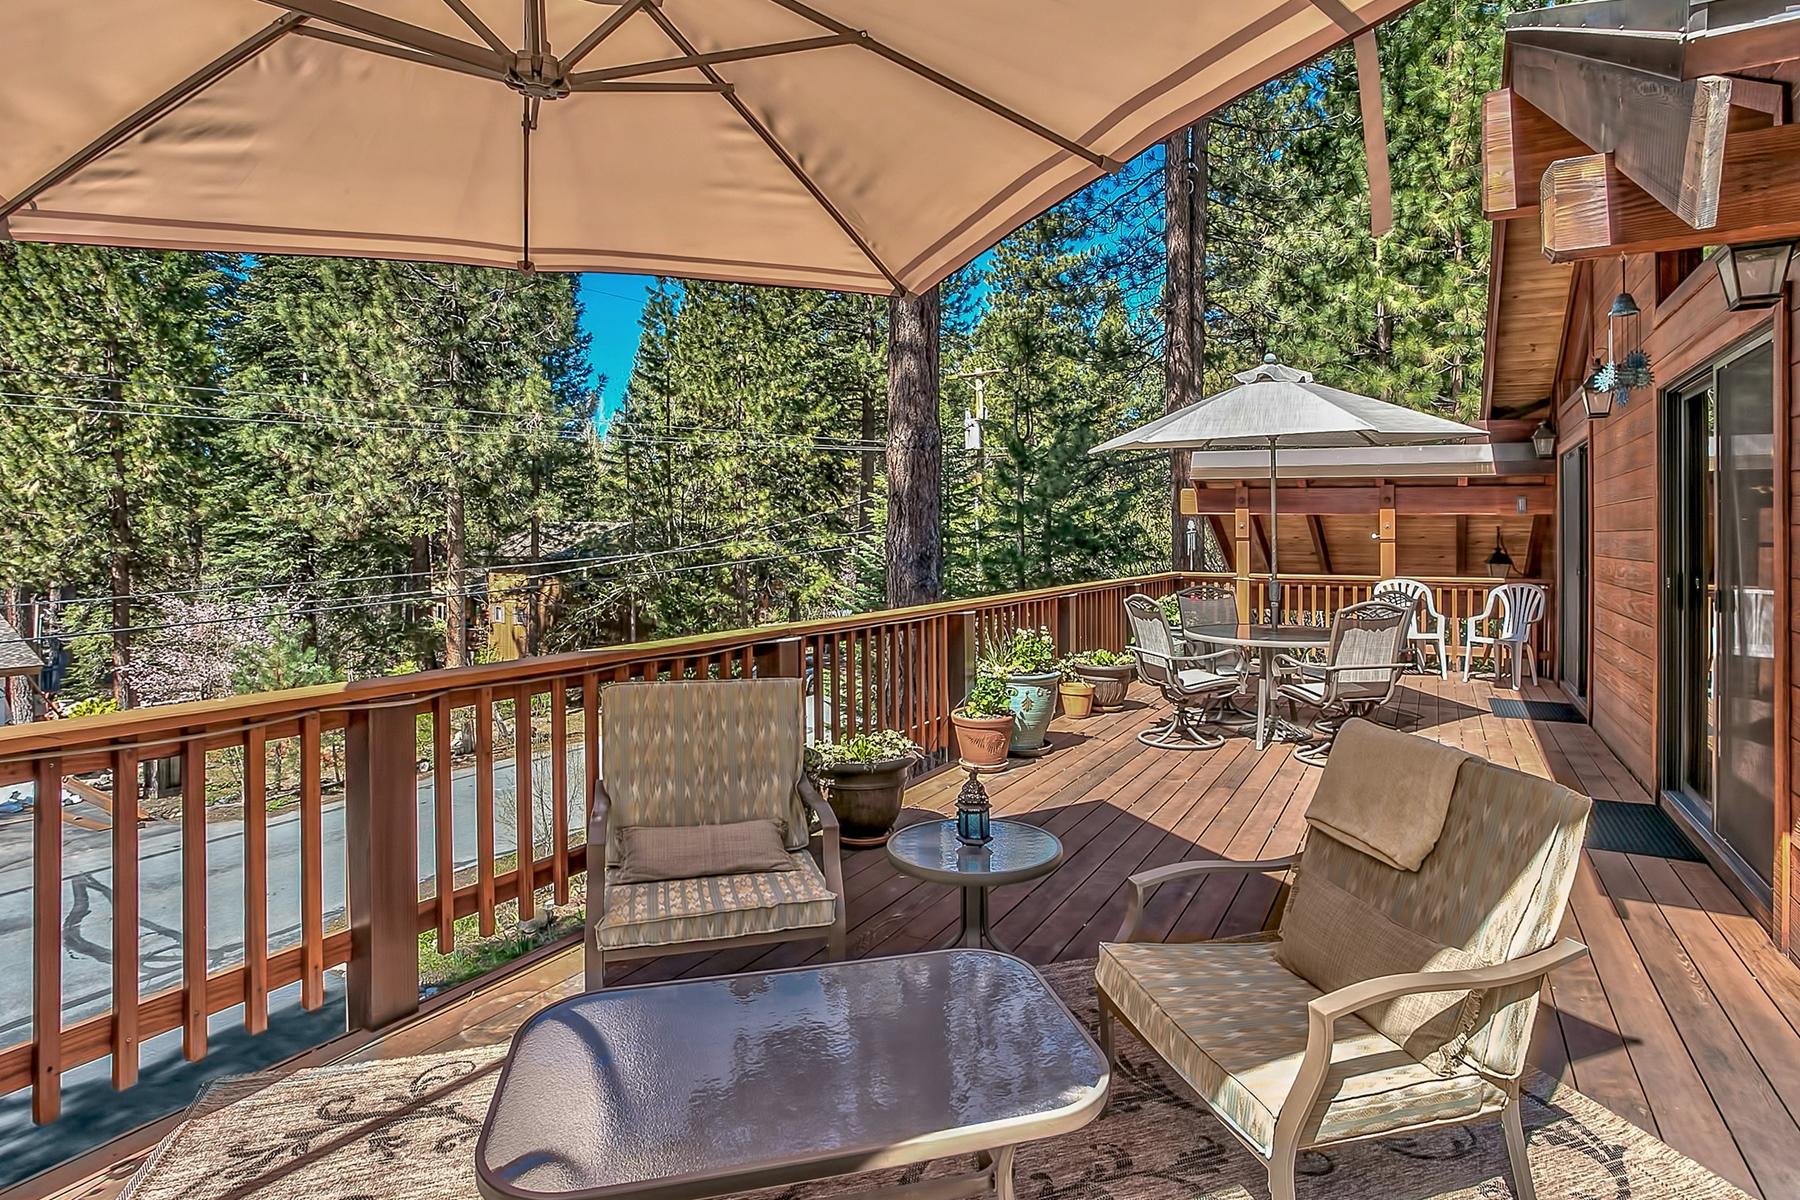 Additional photo for property listing at 842 Ophir Peak Road  Incline Village, Nevada 89451 Estados Unidos